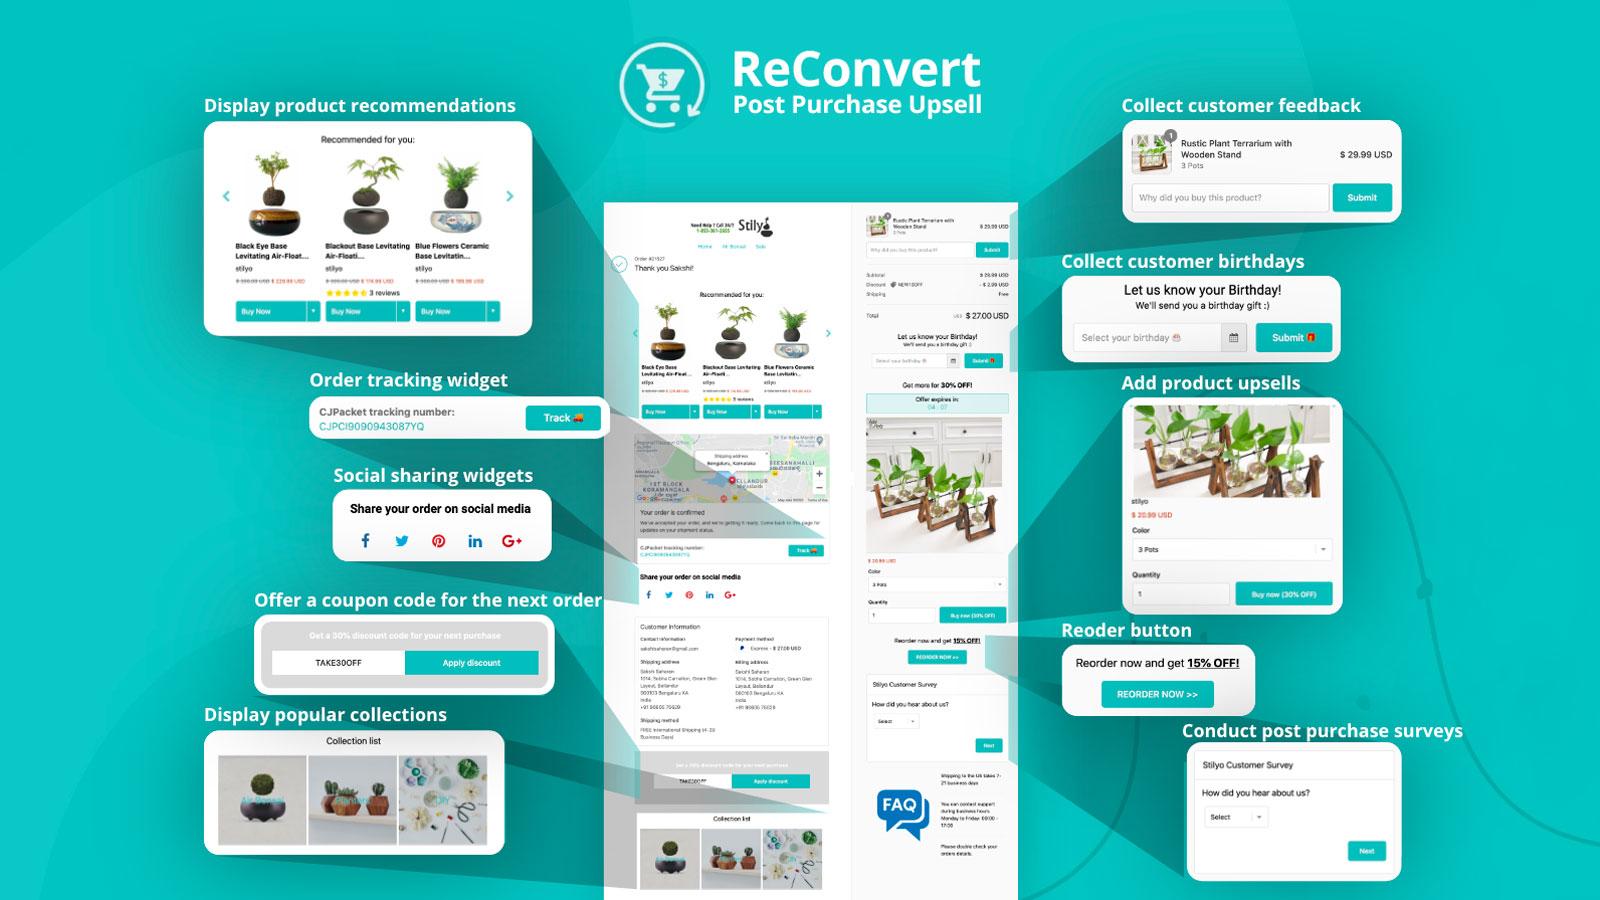 Best Upsell Shopify Apps - ReConvert - Robert Mullineux 2020